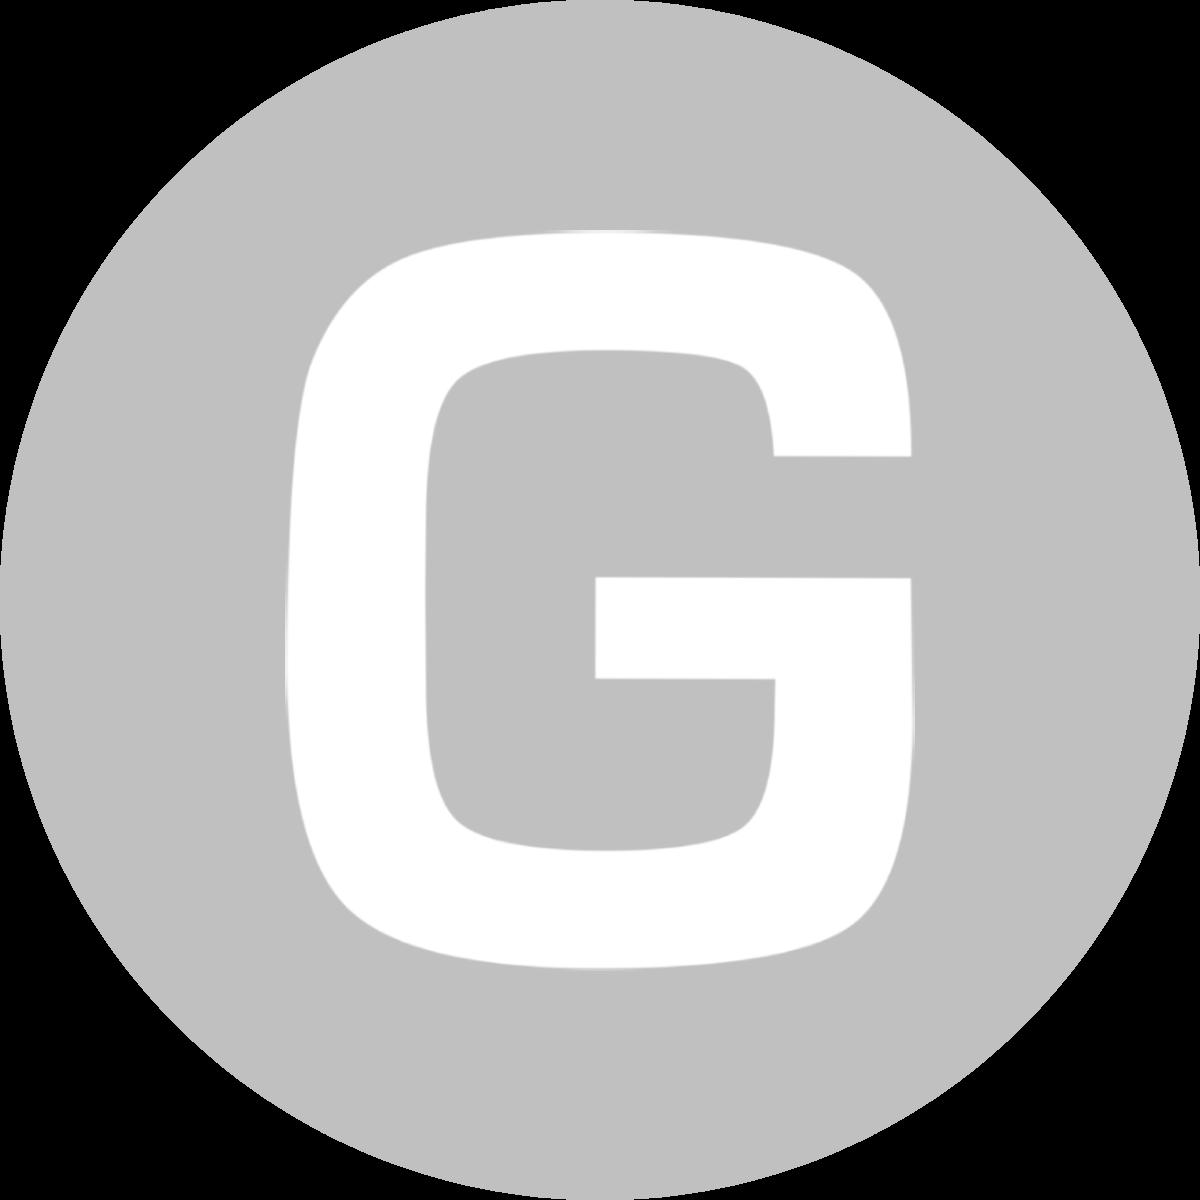 LOGO - PitchFix Hatclip - Markør